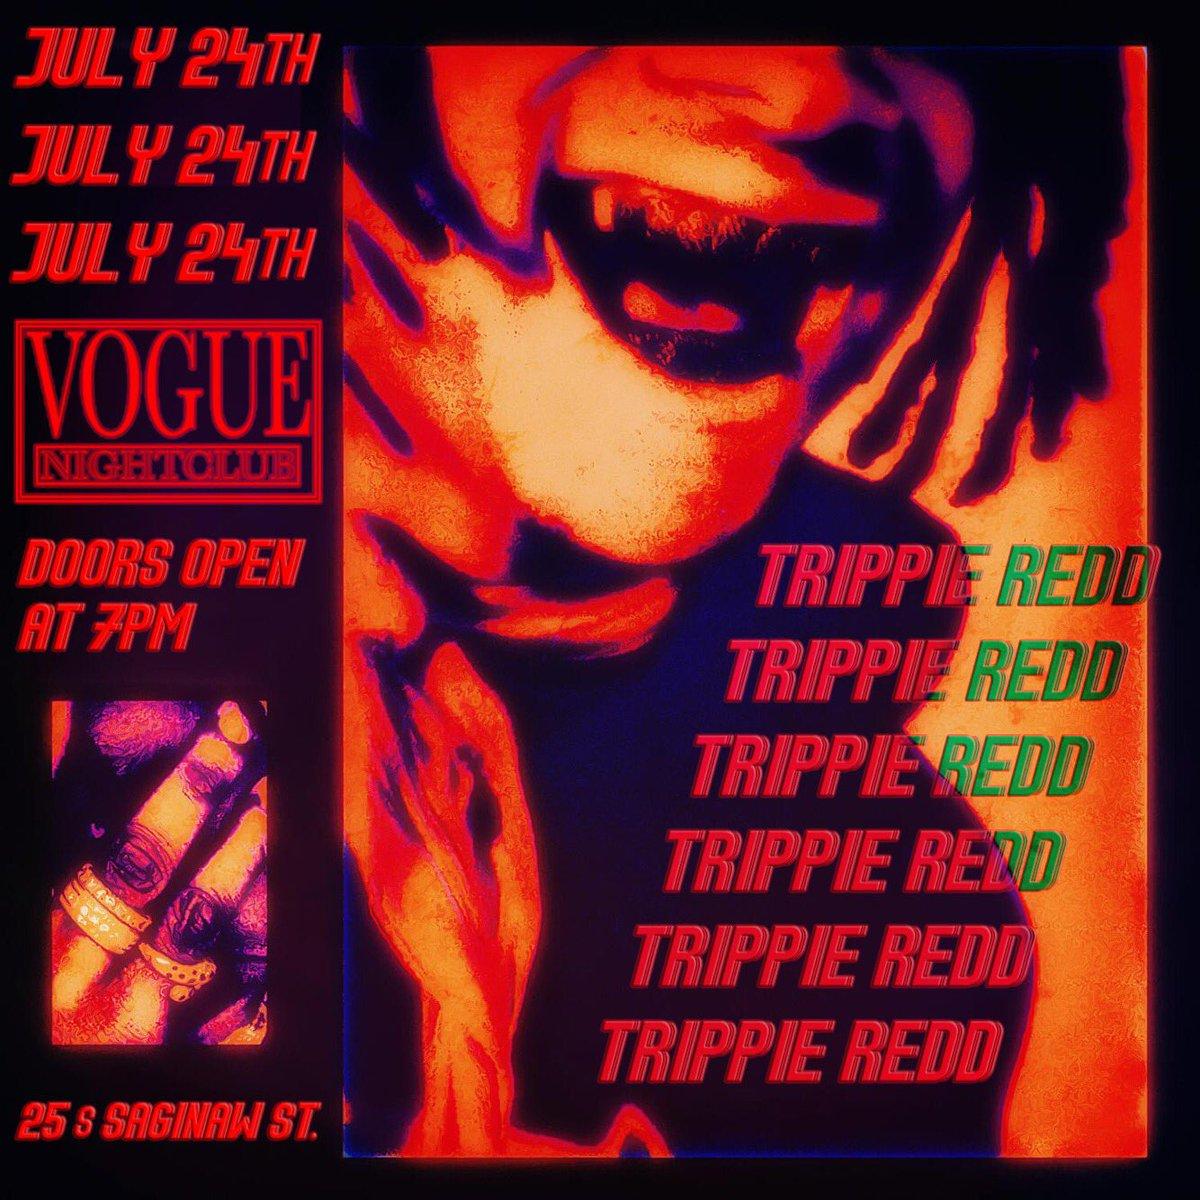 Big 14 gonna be there go get your tickets eventbrite.com/e/trippie-redd…